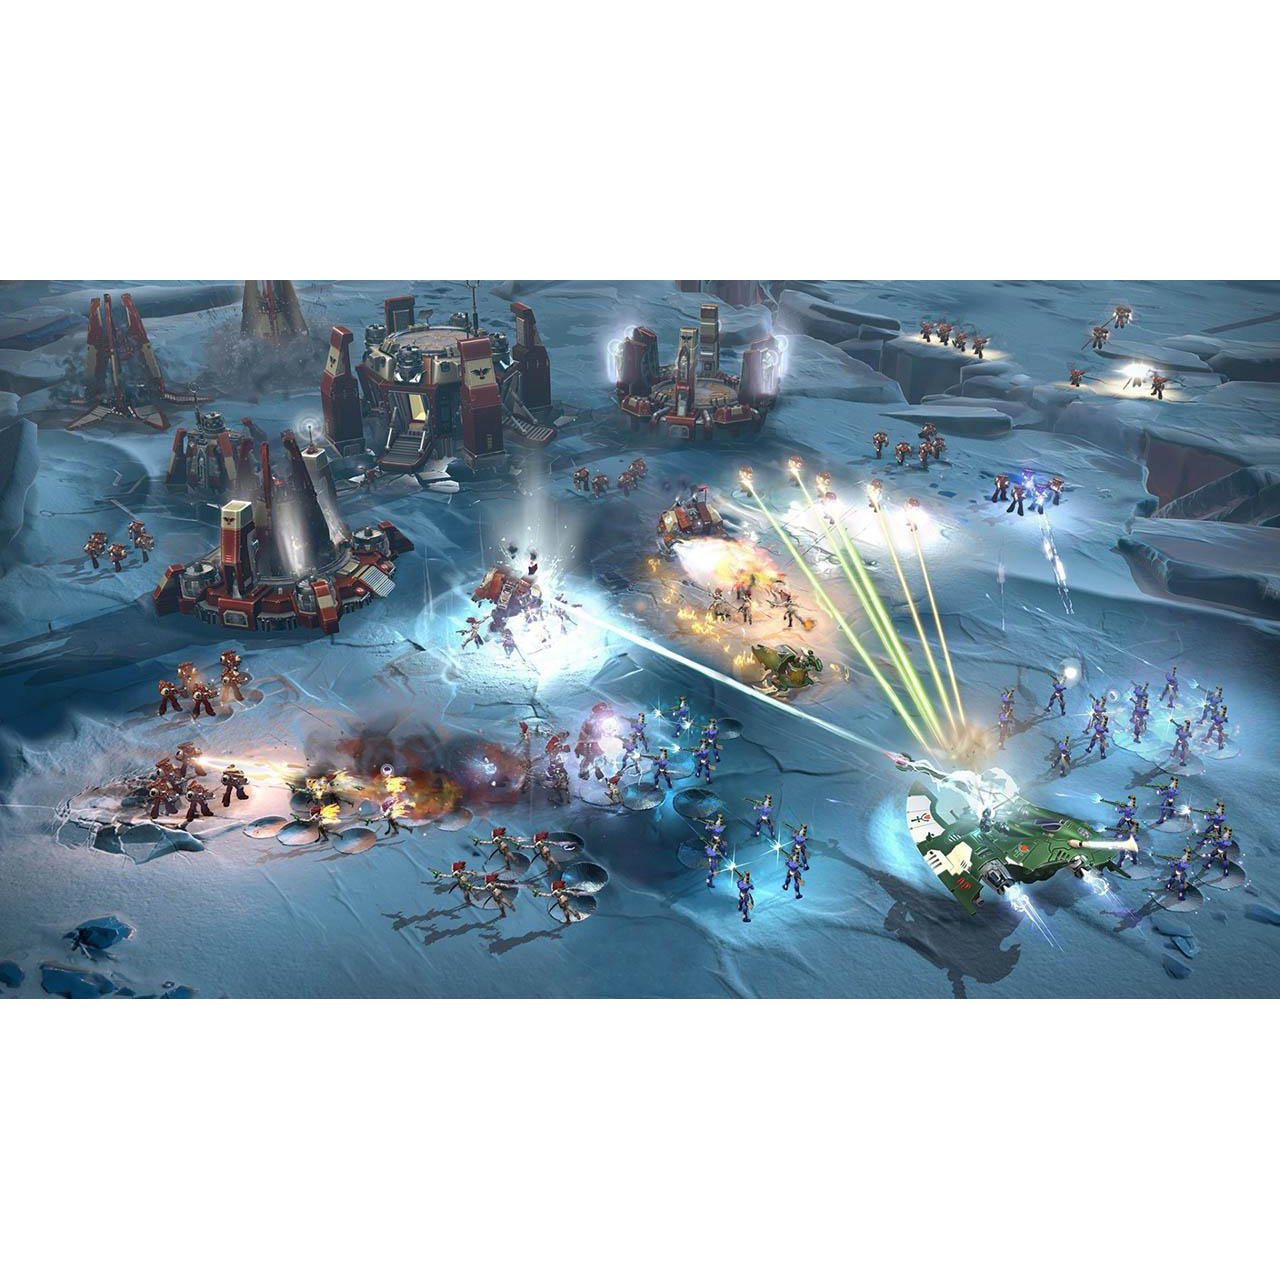 Joc Dawn Of War 3 Limited Edition pentru PC 4